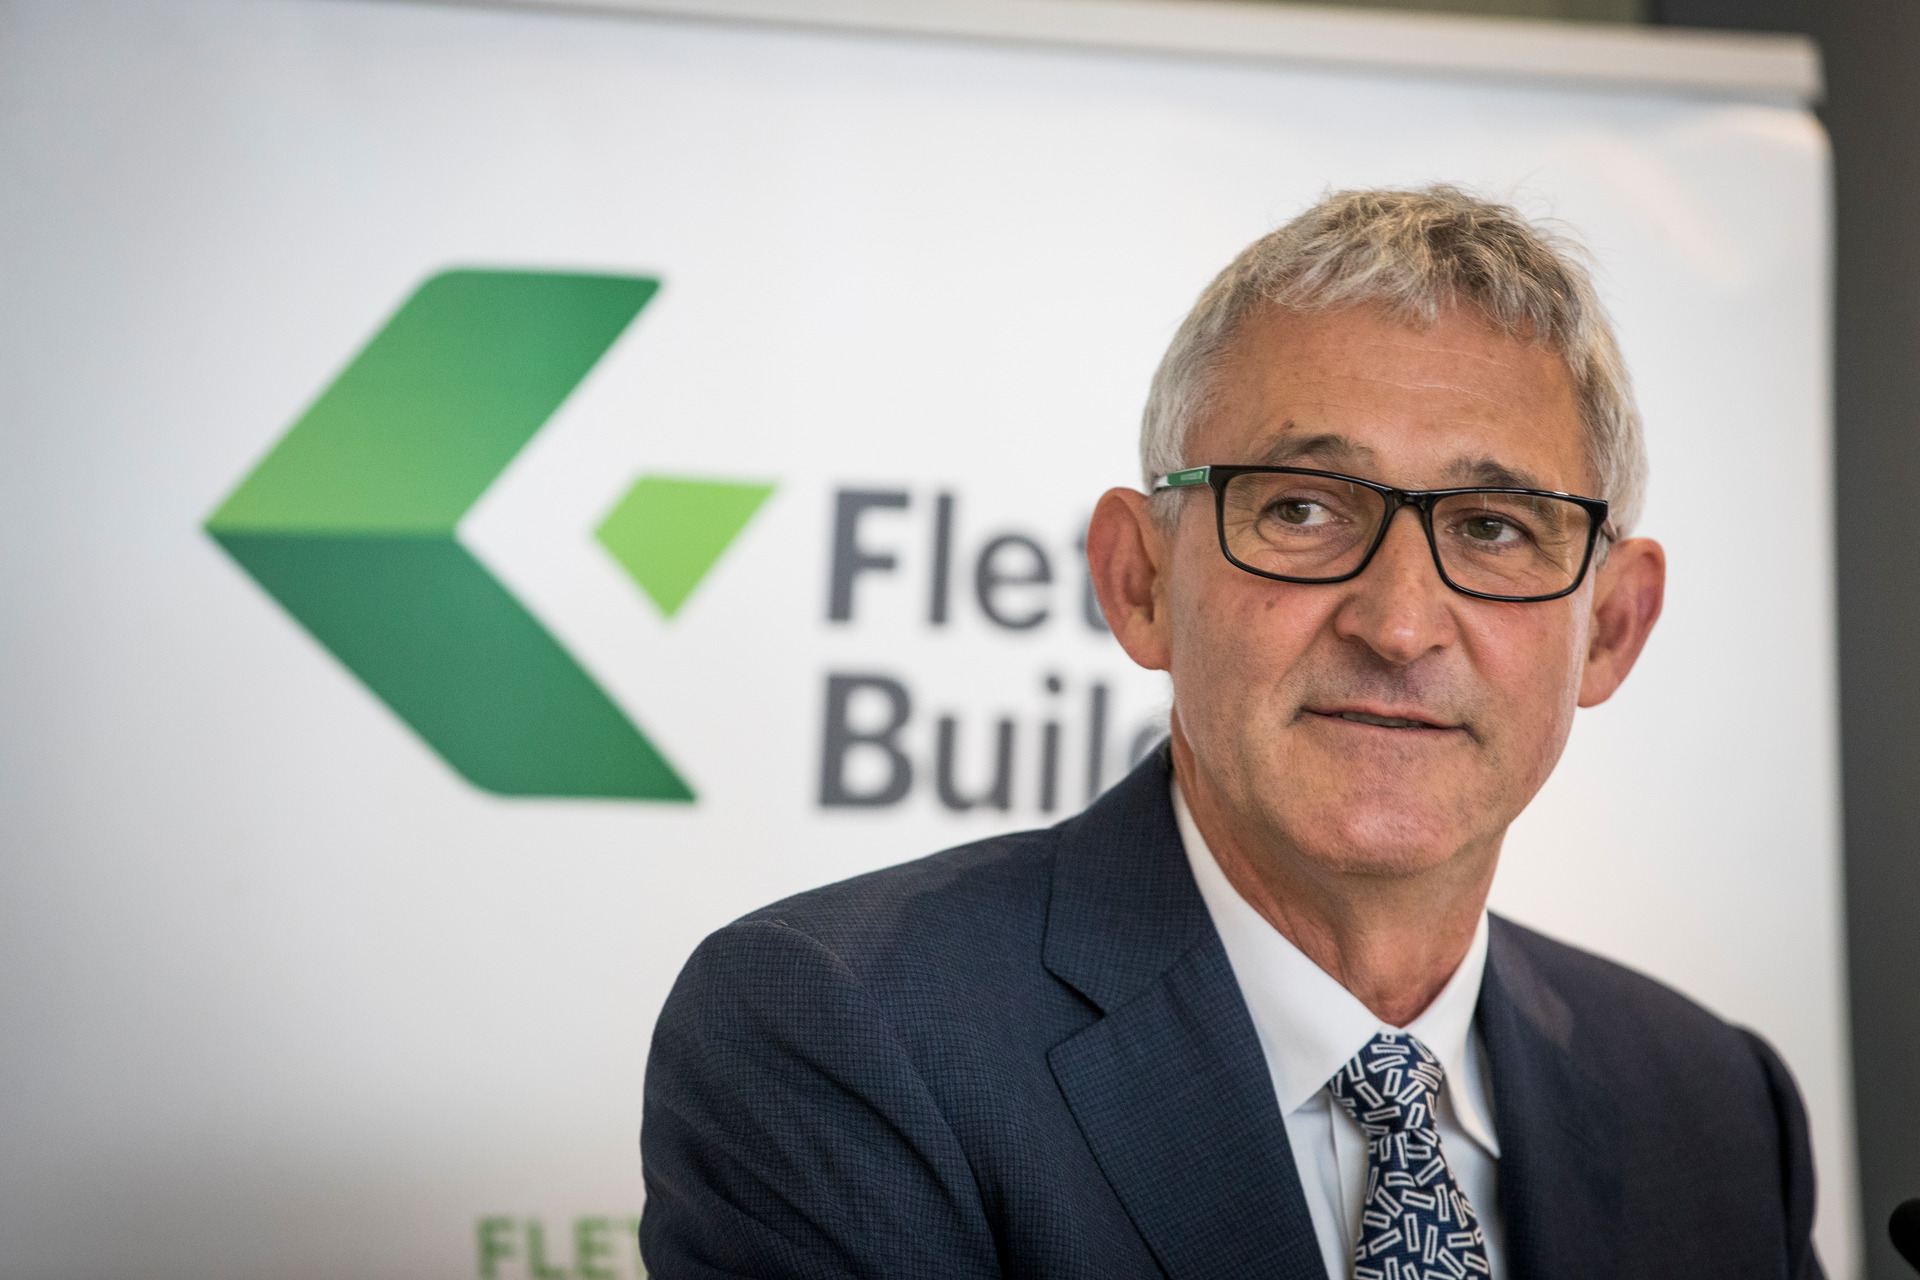 Fletcher to return $300m windfall to shareholders, reinstating dividends